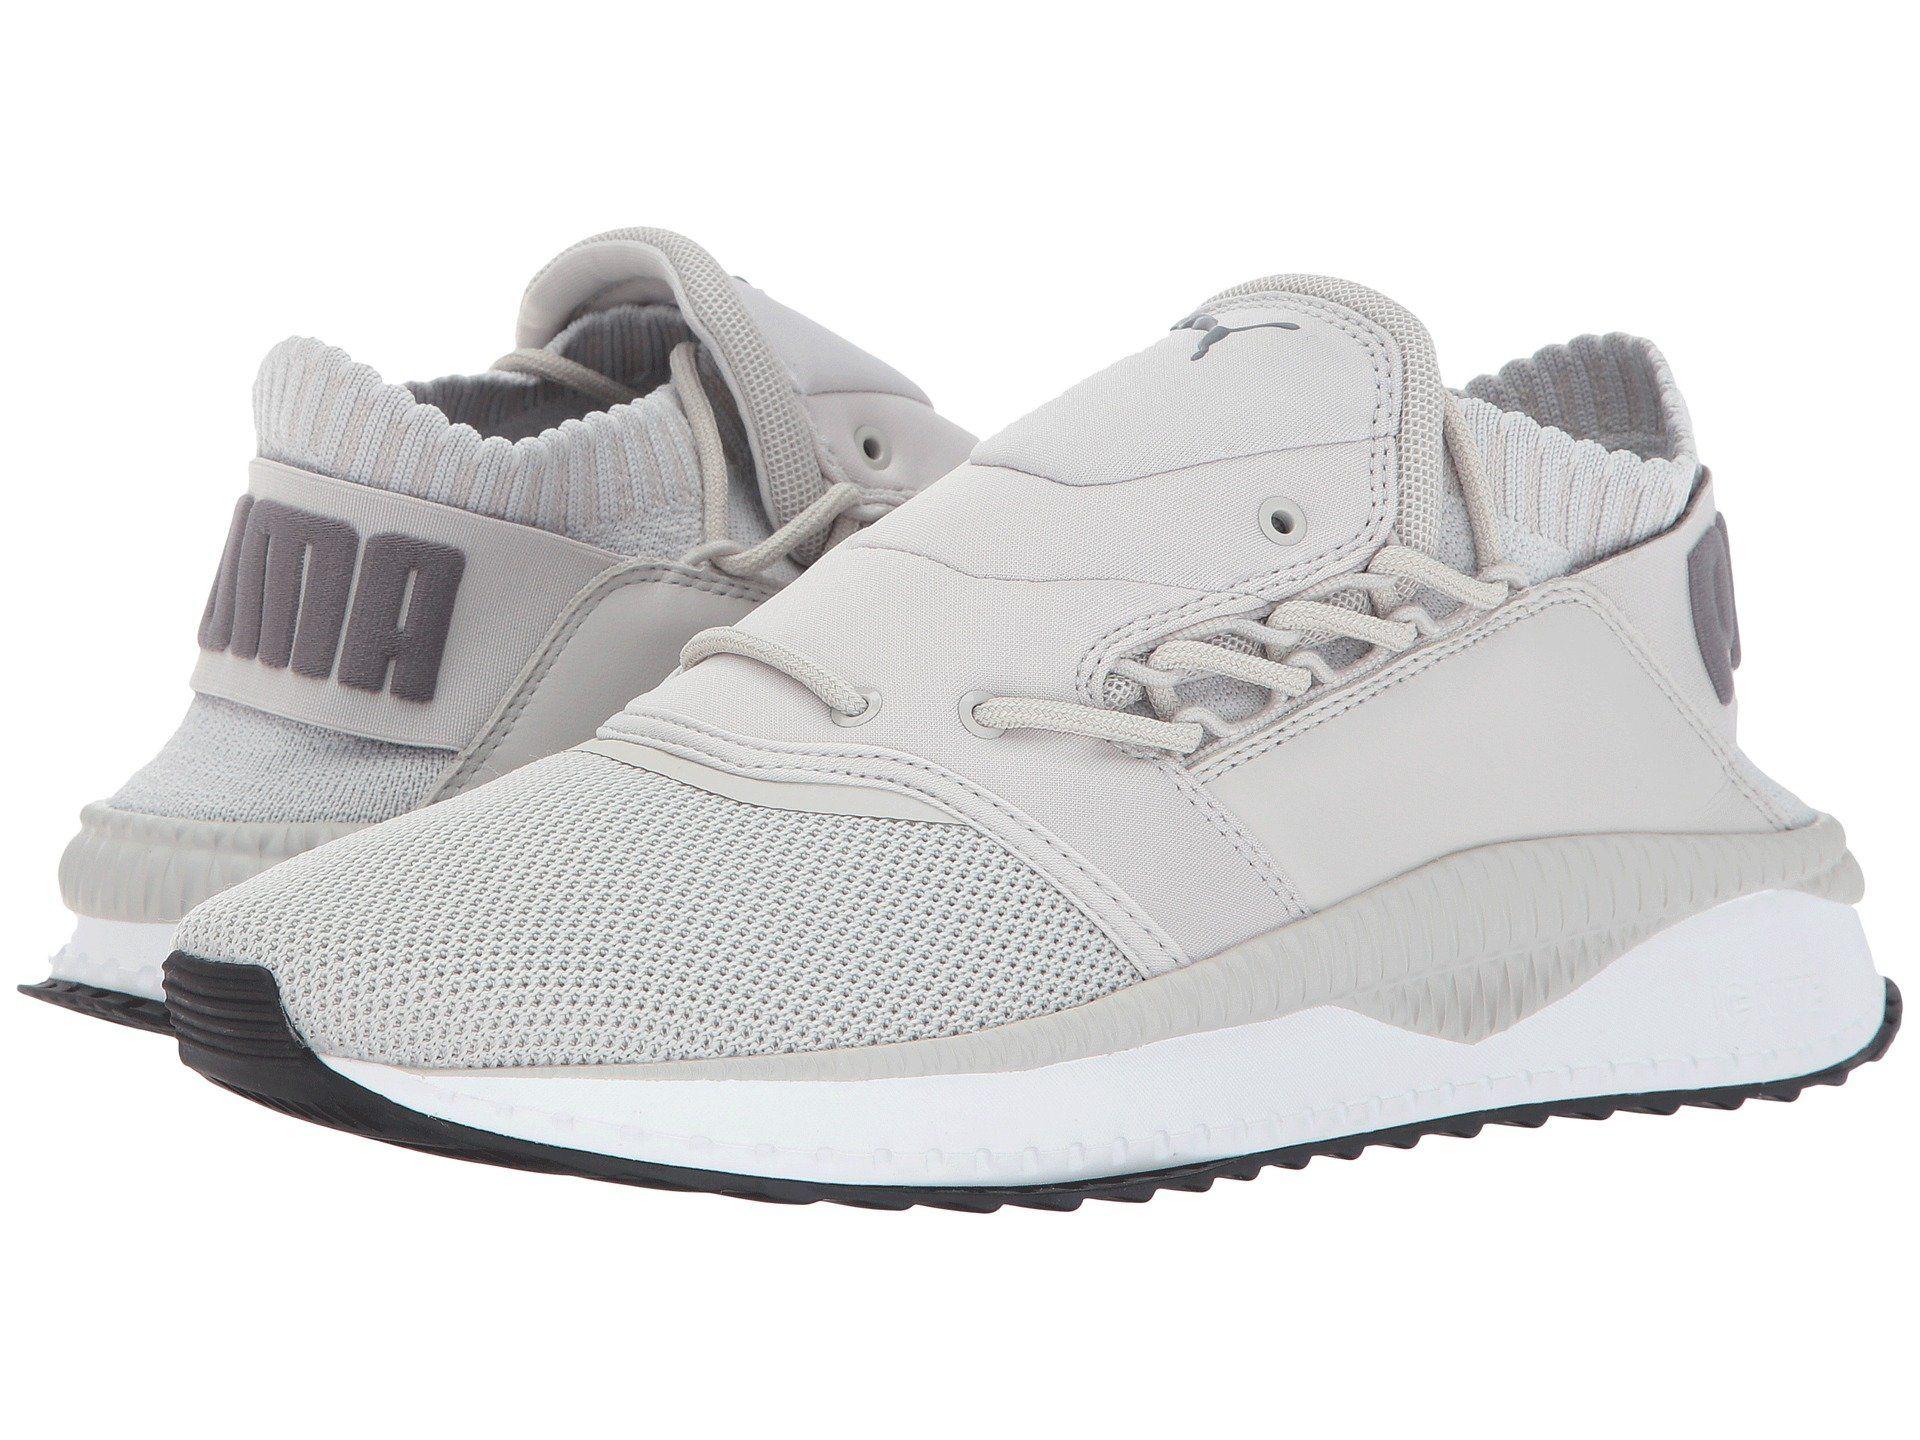 PUMA Tsugi Shinsei. #puma #shoes # | Shoes mens, Sneakers